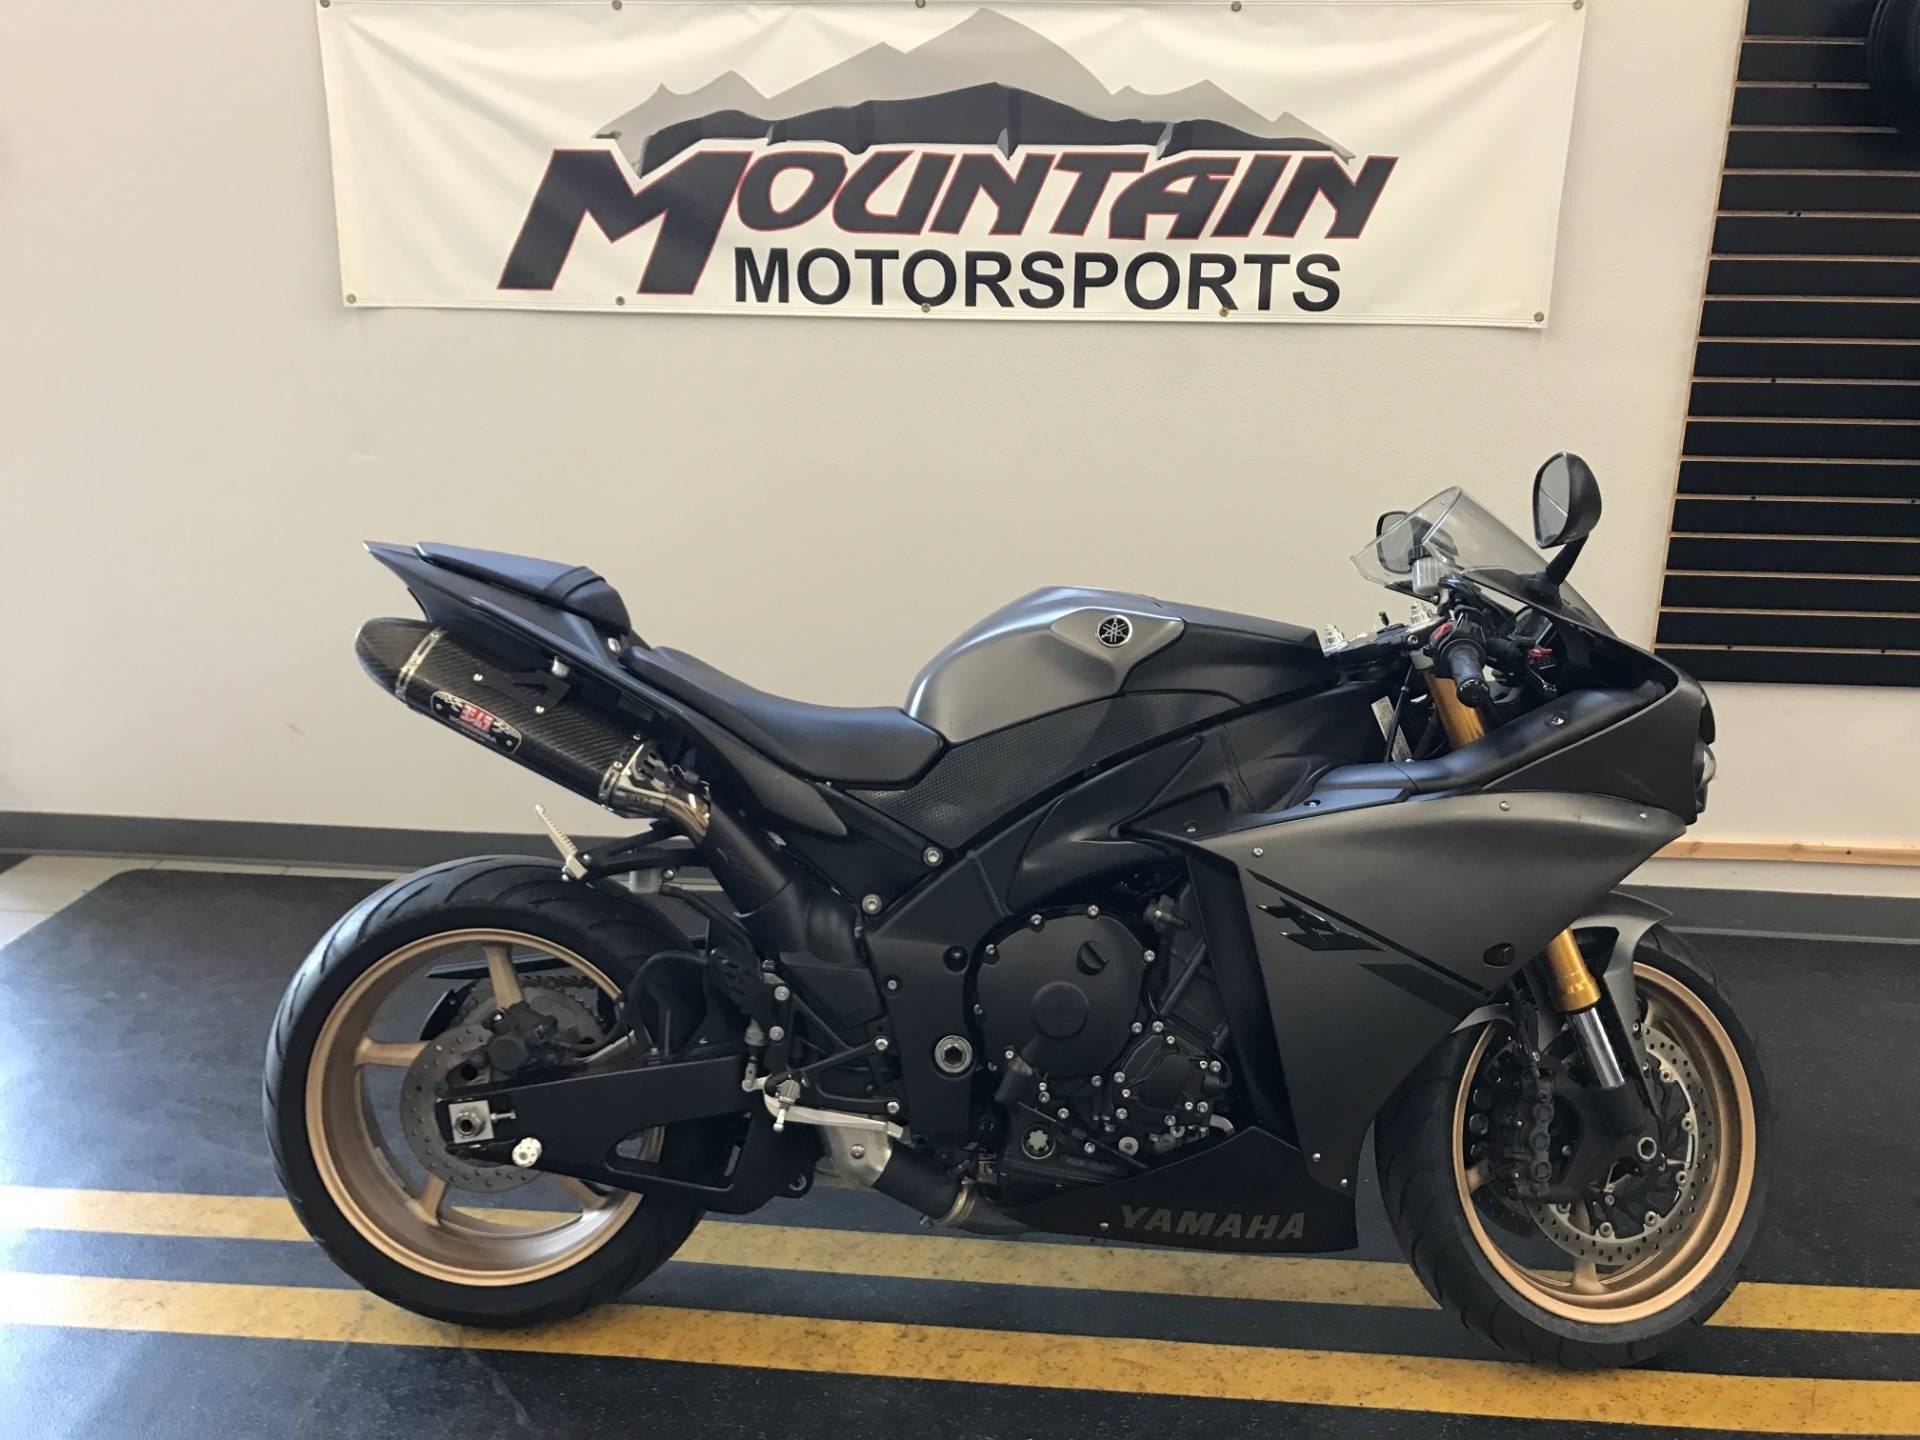 2014 Yamaha YZF-R1 for sale 66160